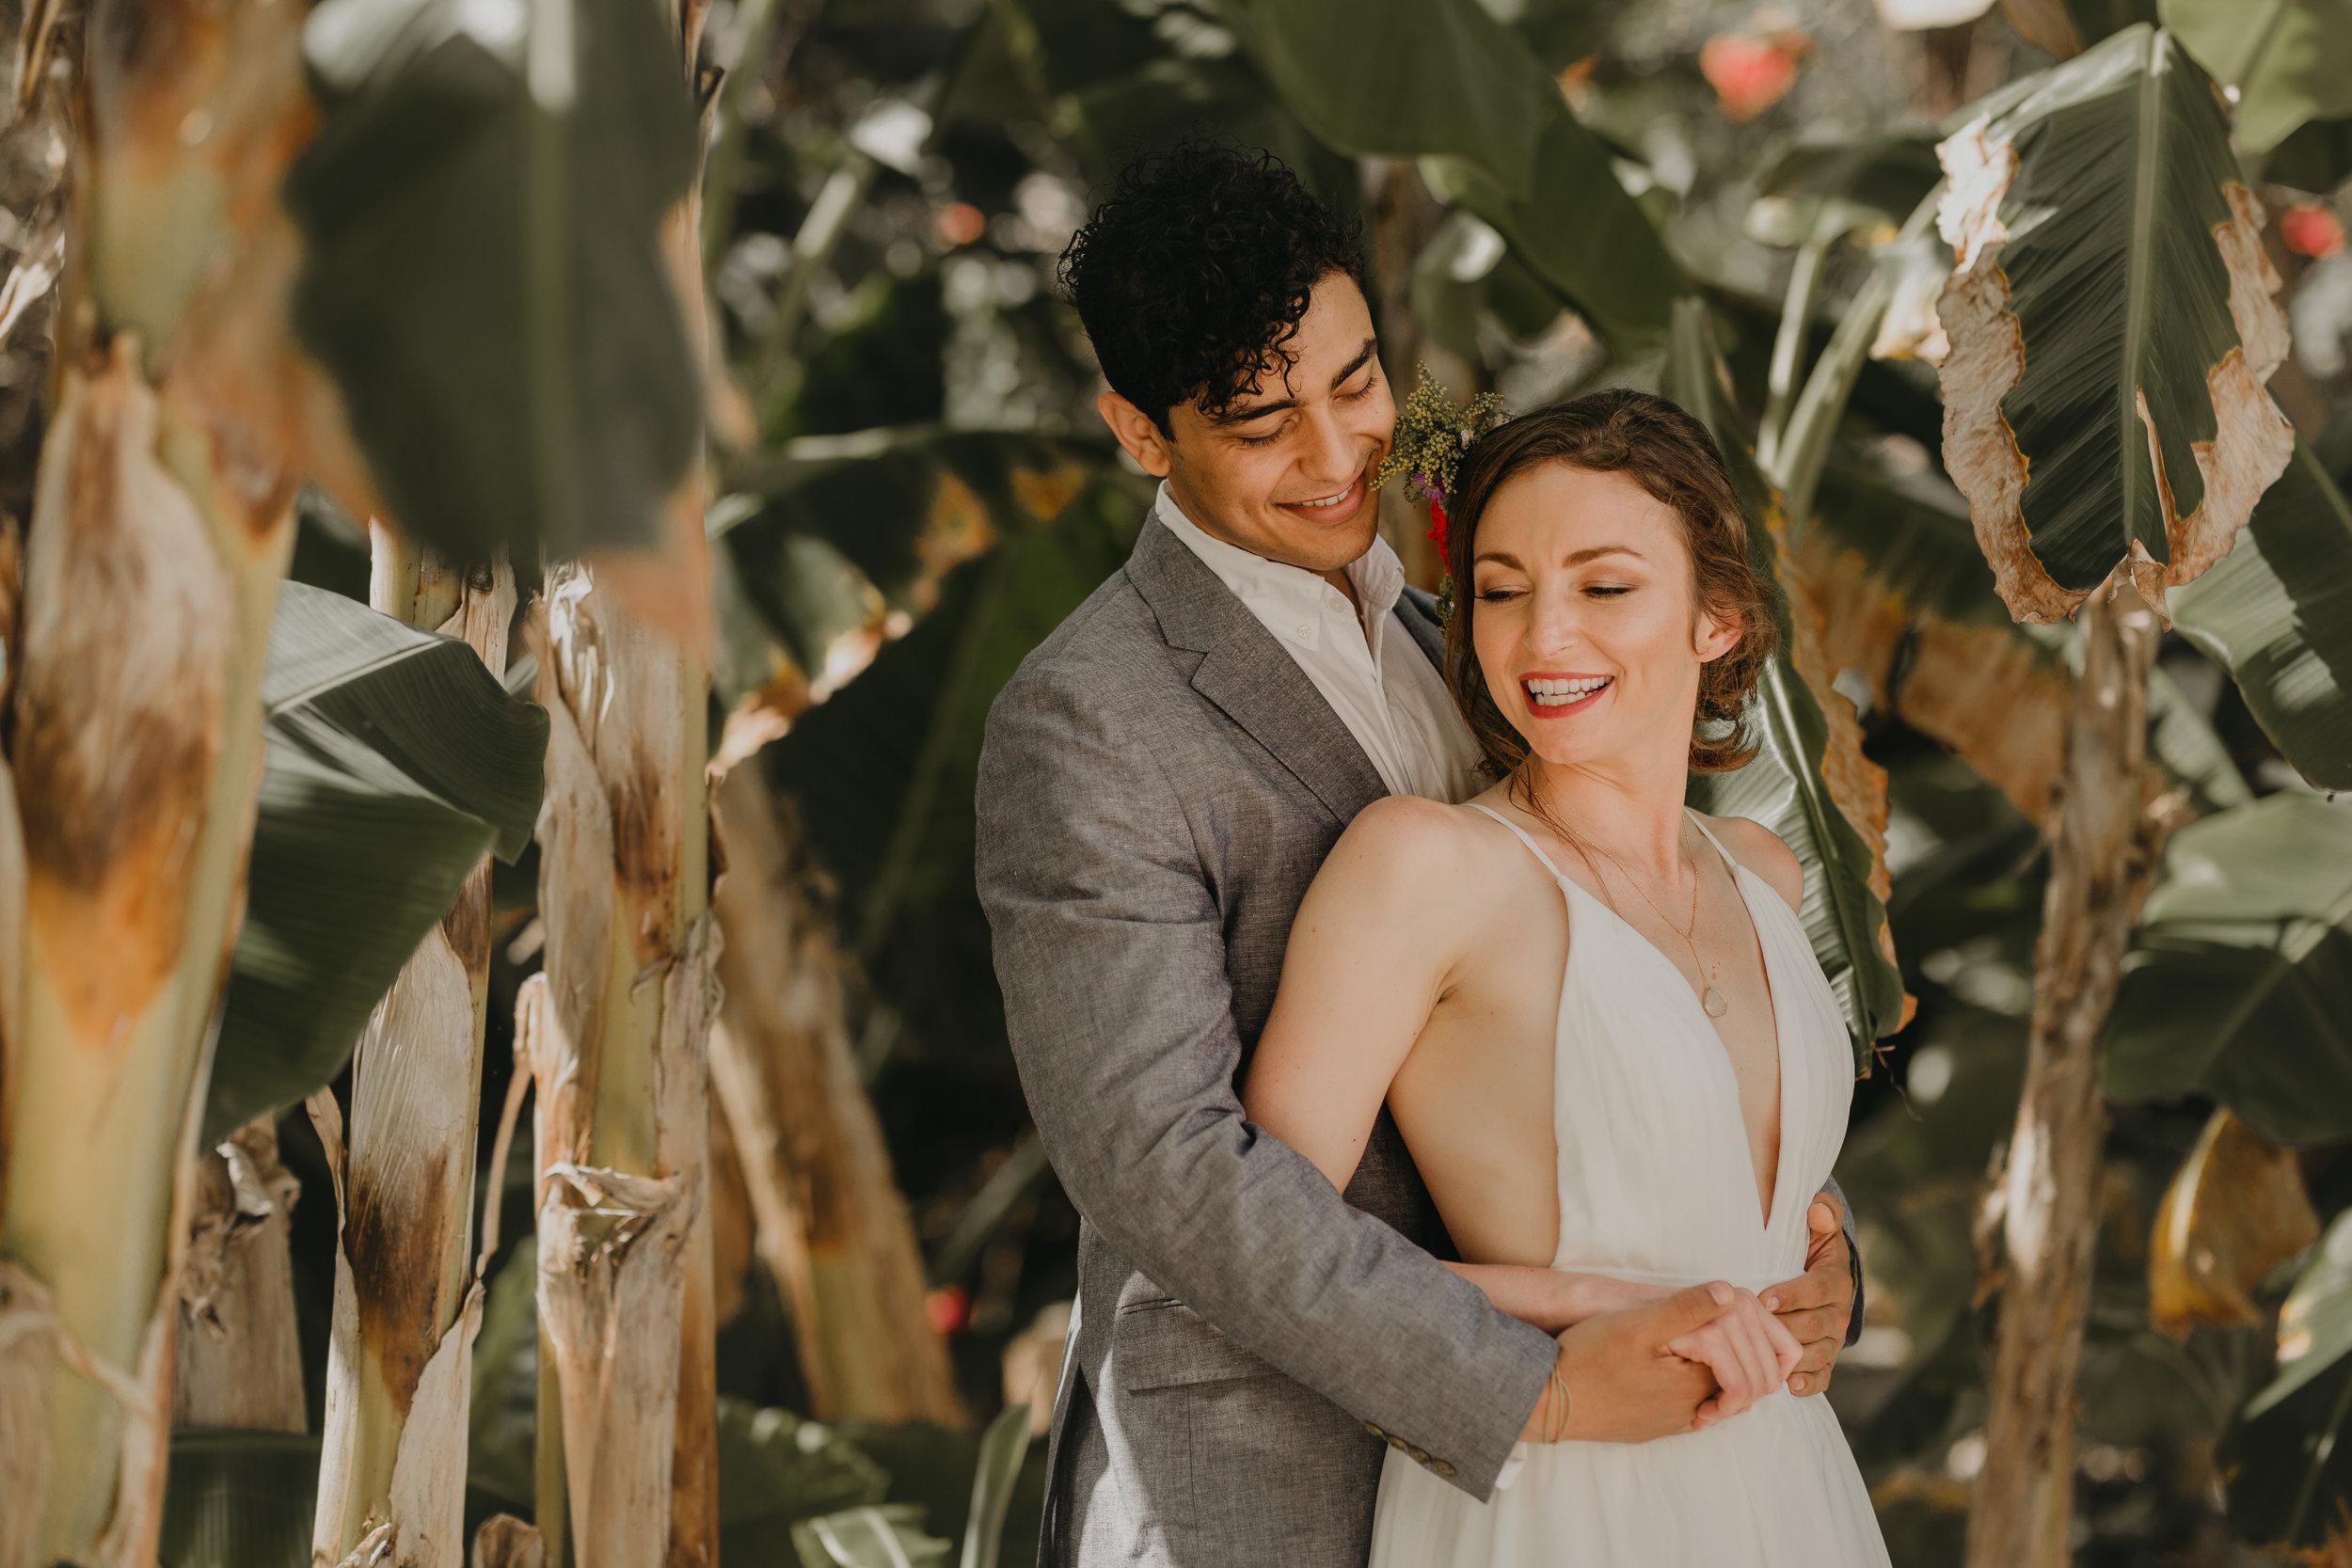 Nicole-Daacke-Photography-beachfront-akumal-destionation-wedding-tulum-mexico-elopement-photographer-destination-wedding-inspiration-sunset-champagne-pop-boho-bride-ocean-tropical-bohemian-tulum-wedding-photos-113.jpg